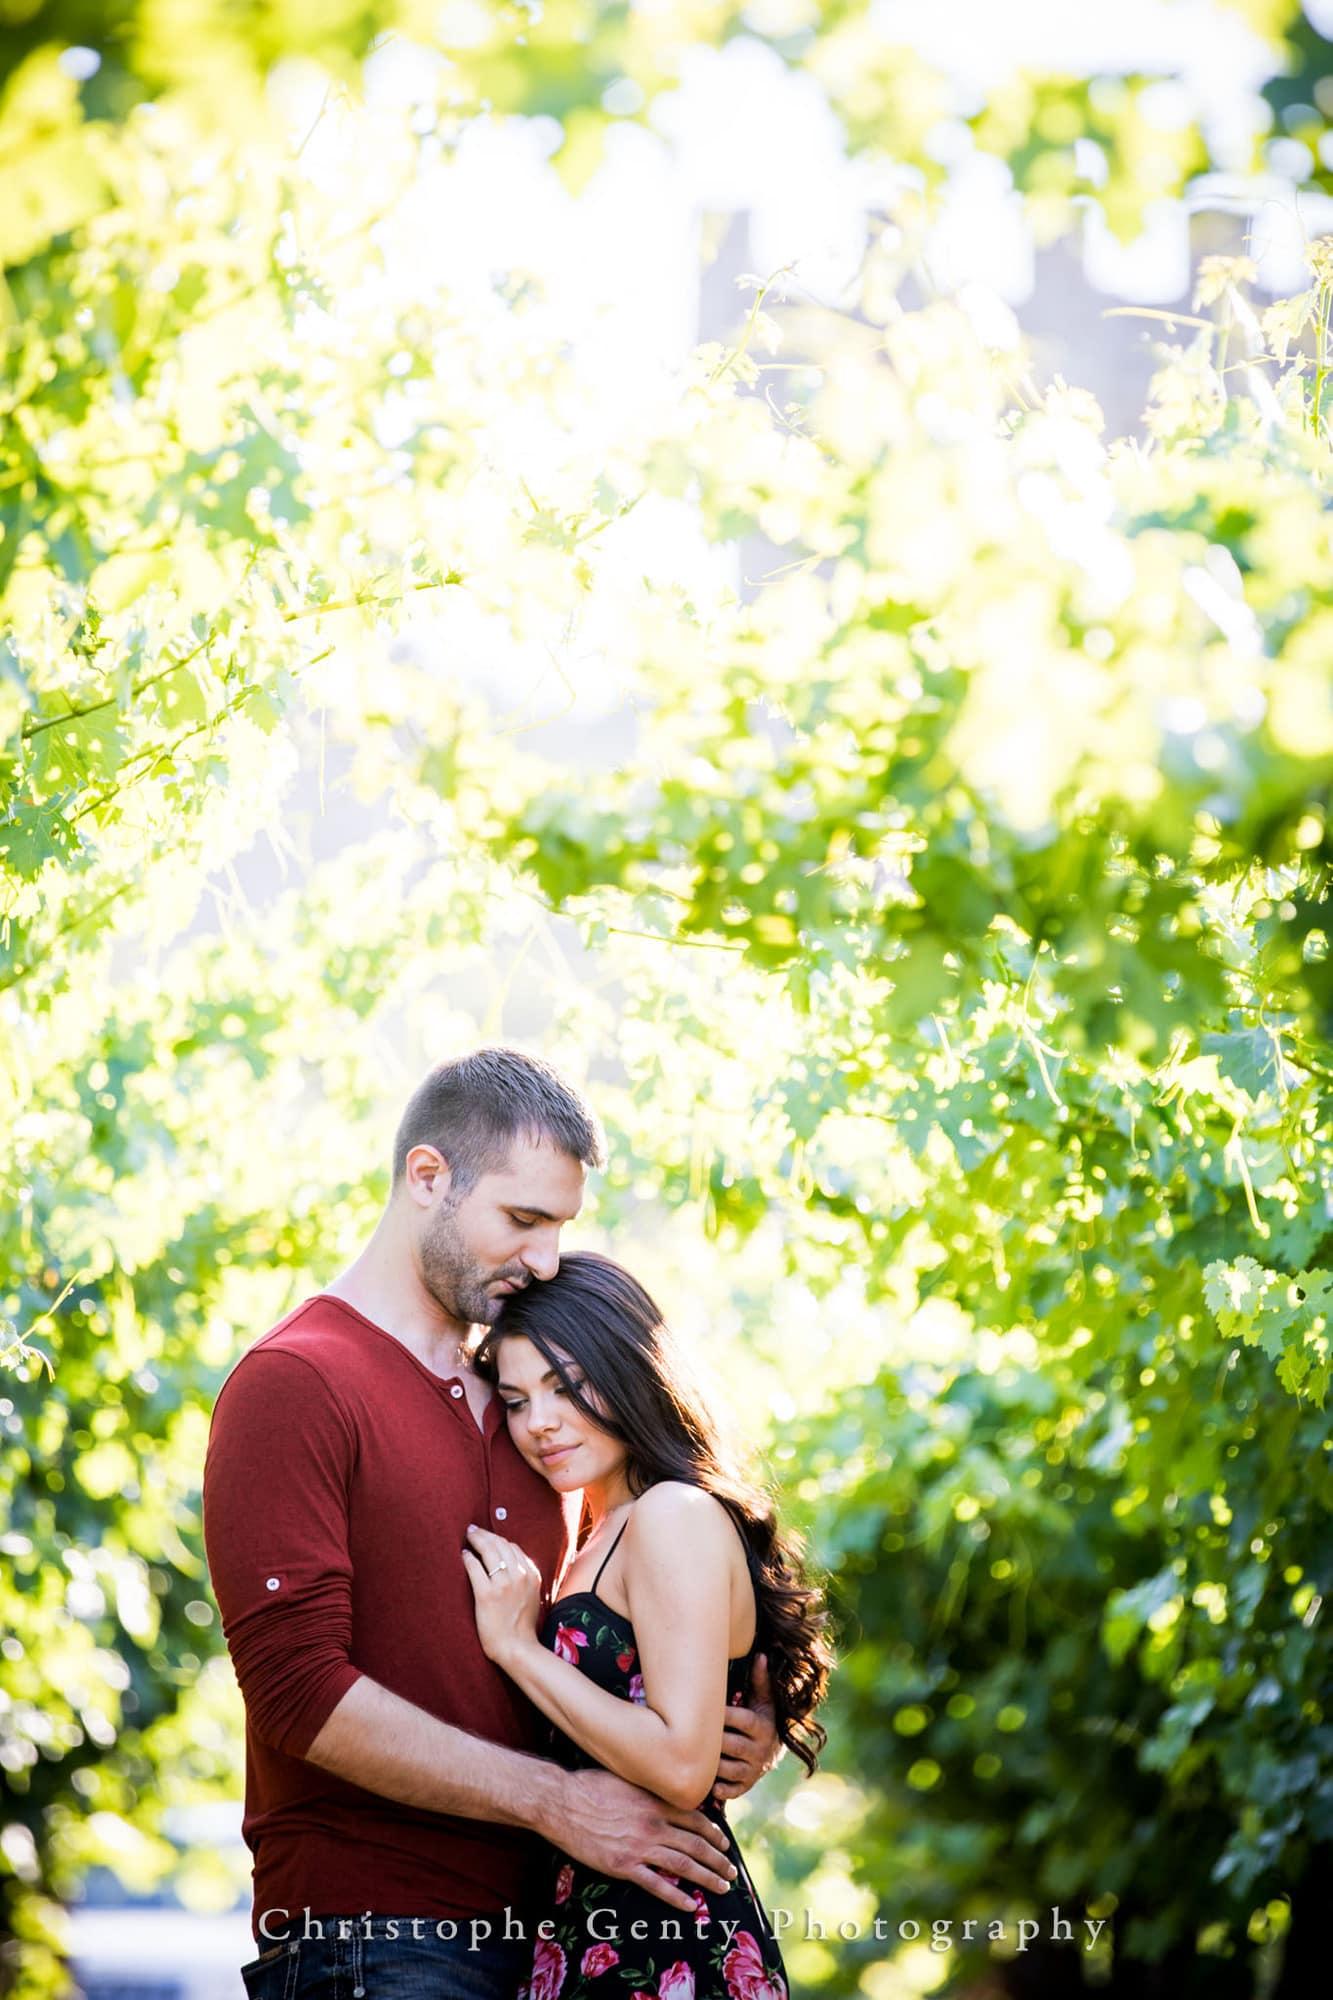 Castello di Amorosa Marriage Proposal Photography 363